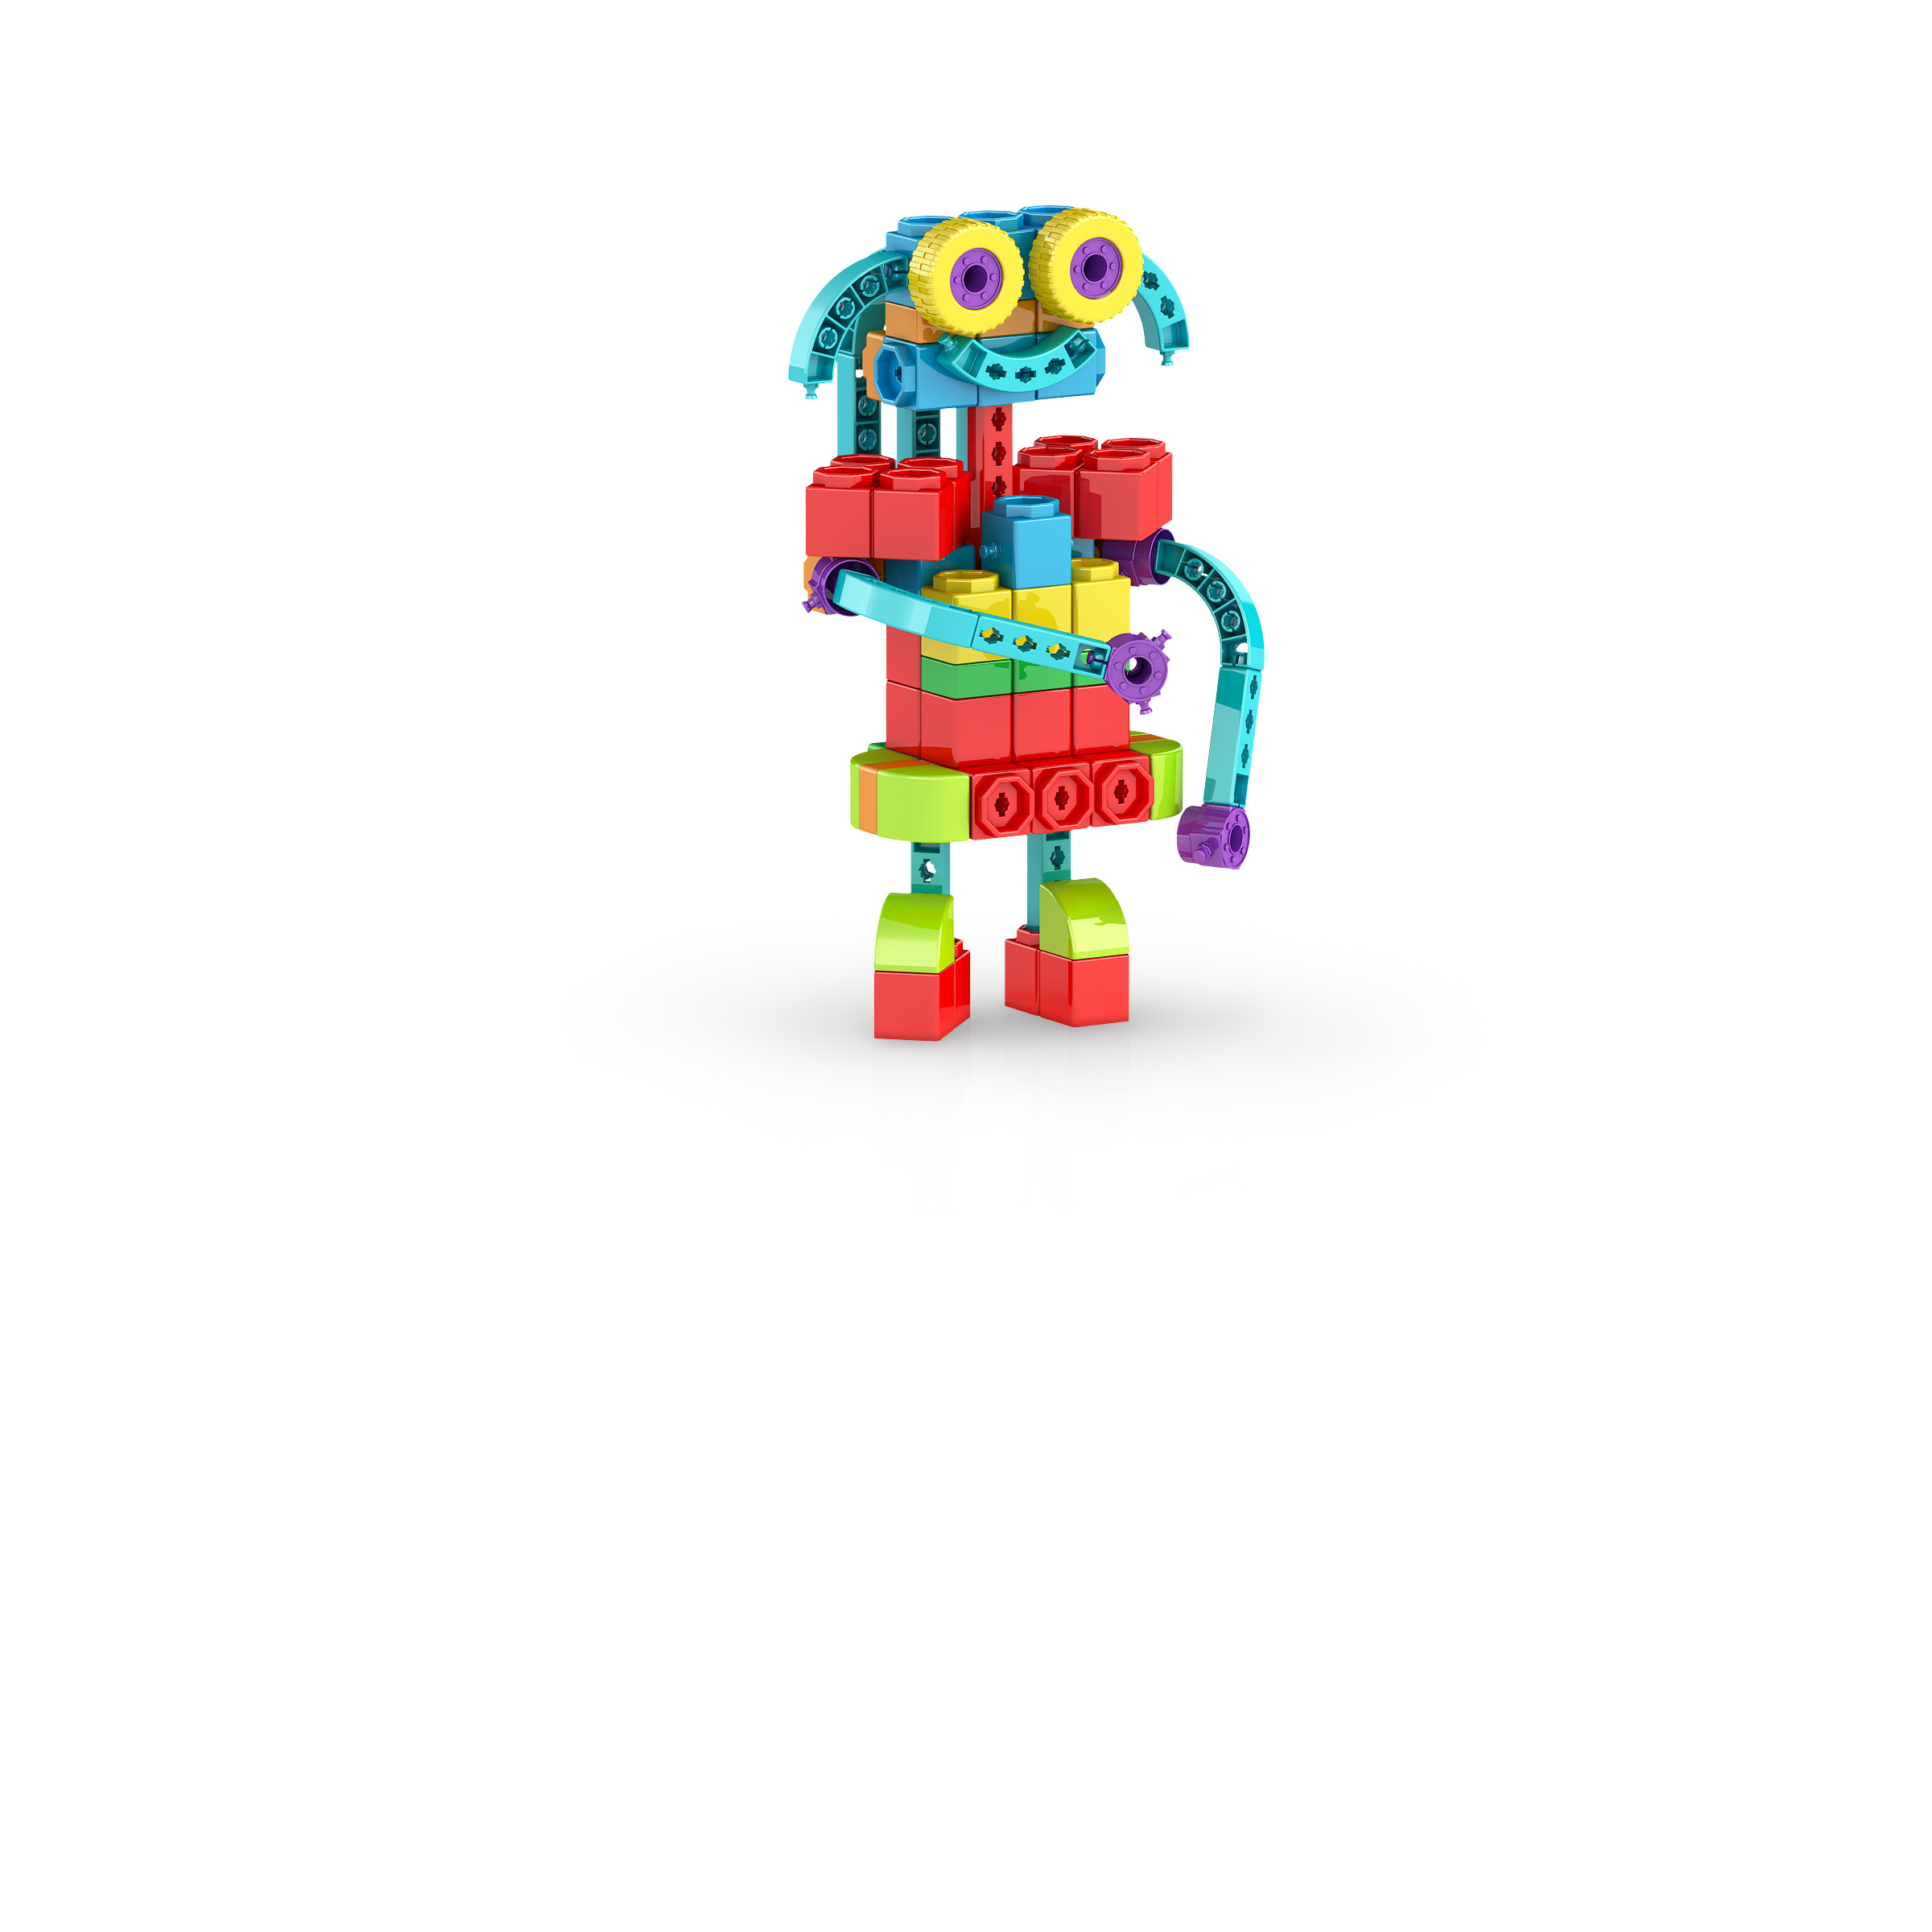 , RobotGirl 2, משחקי חשיבה לילדים engino, משחקים לגיל הרך playgro, משחק הרכבות אנג'ינו, משחקי רכבות